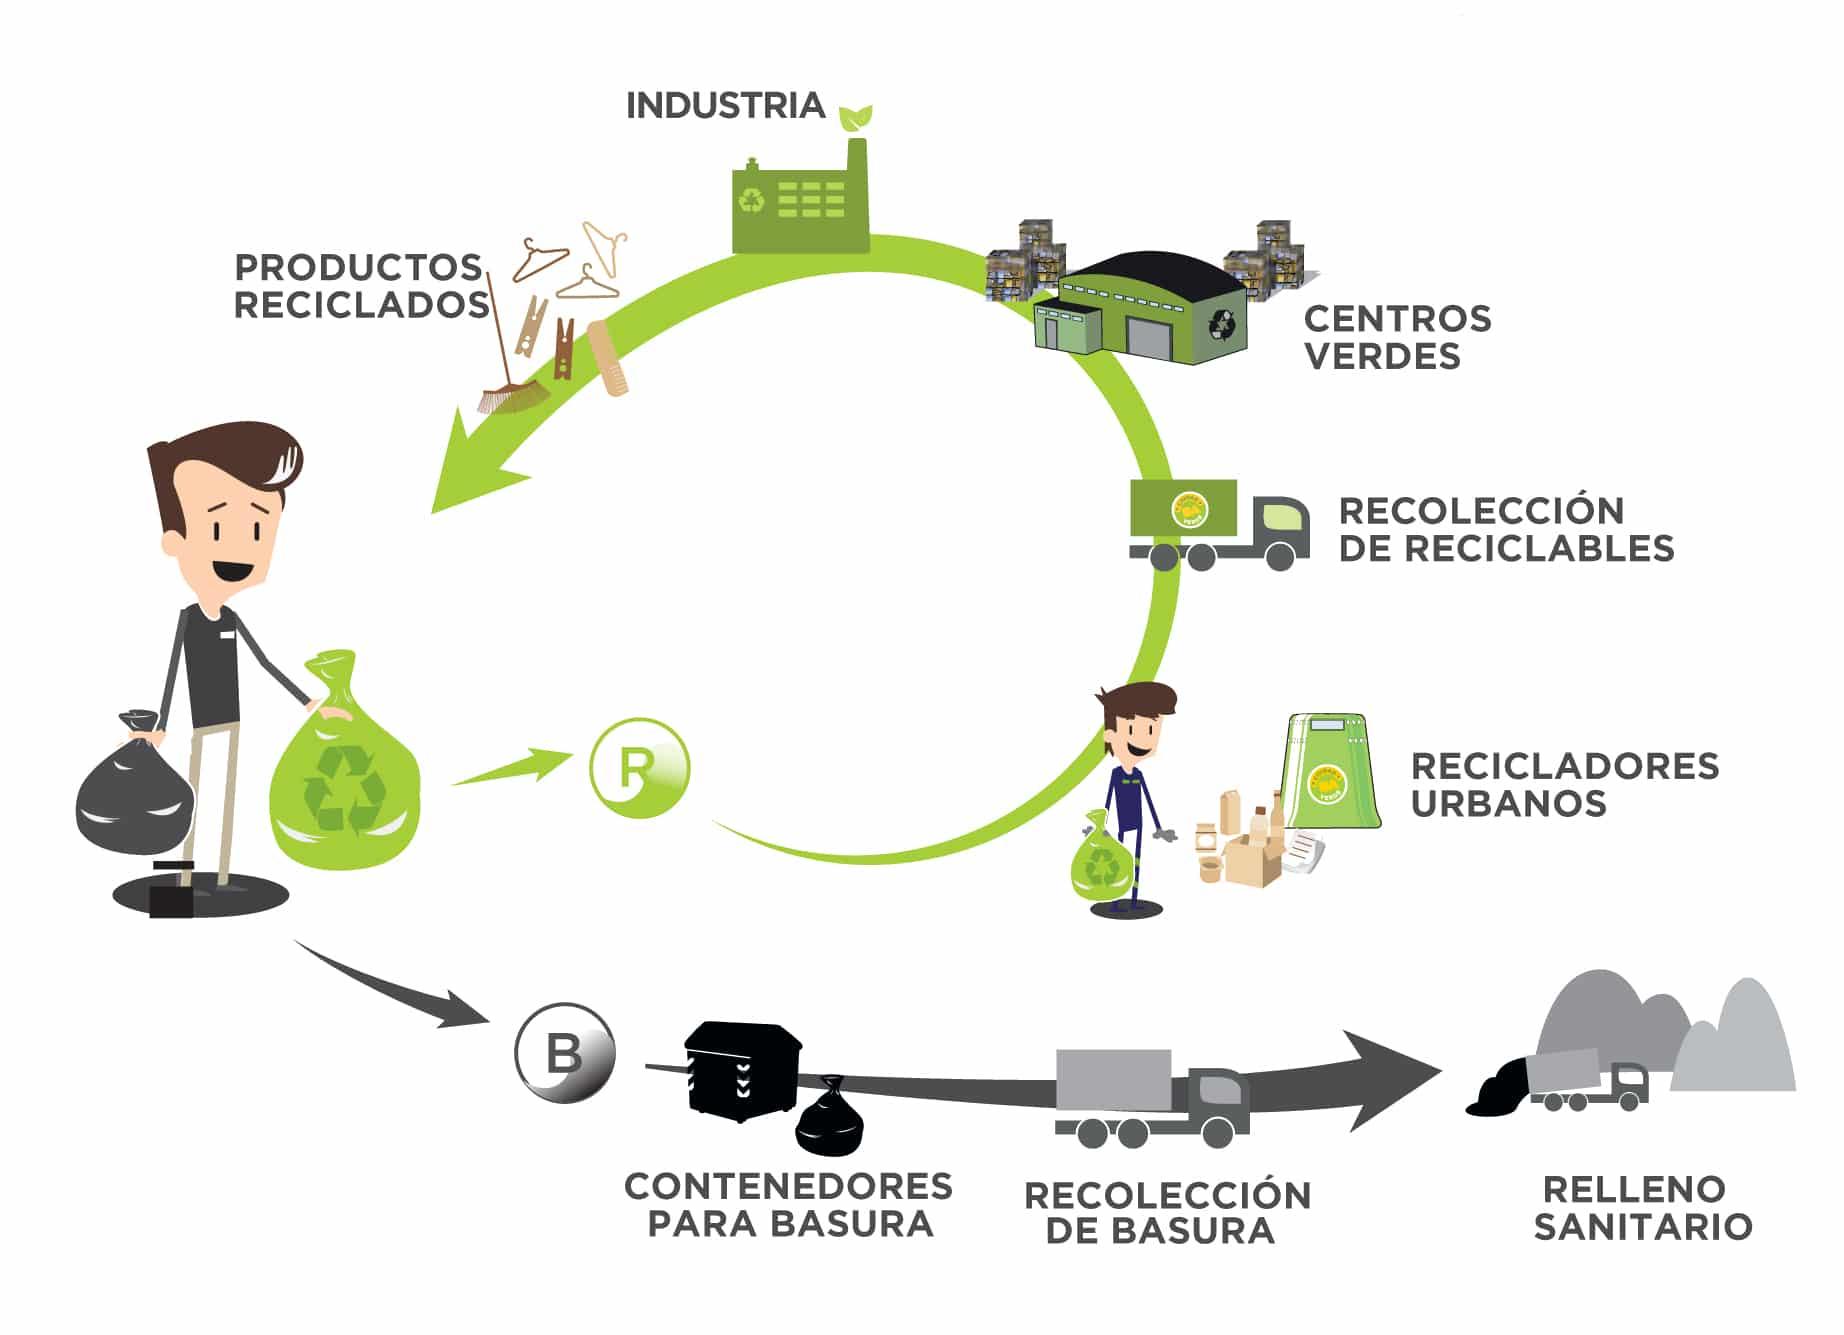 Ideas de negocios verdes para emprender. II Parte